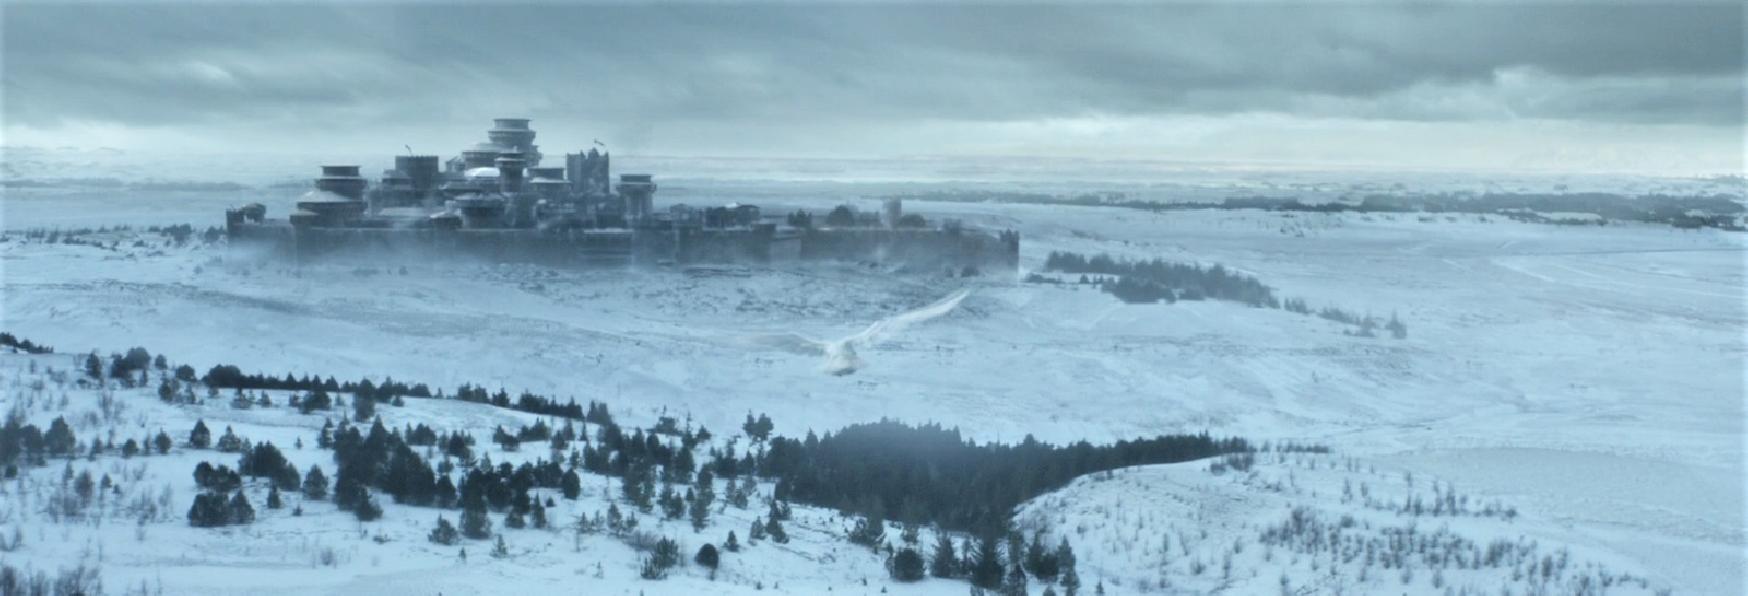 Game of Thrones: HBO rilascia un Nuovo e Intrigante Teaser Trailer